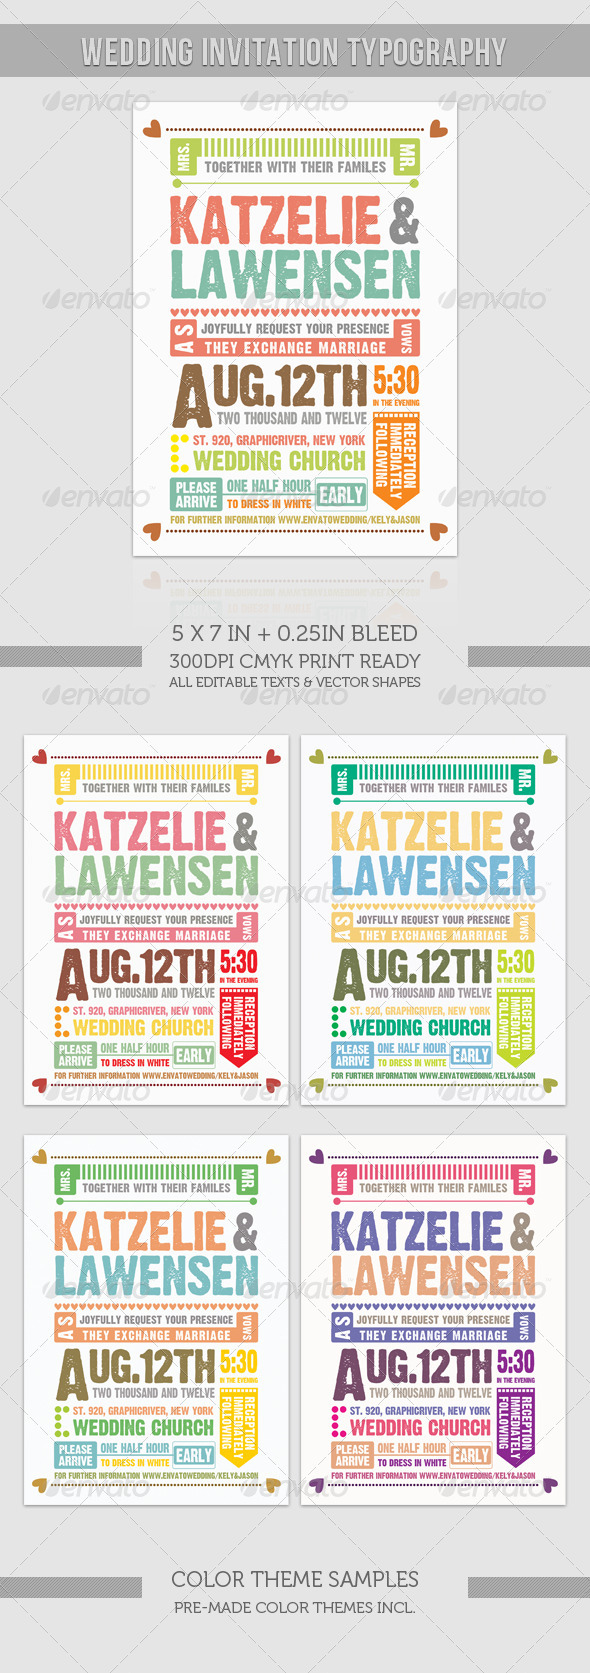 GraphicRiver Wedding Invitation Typography 976783